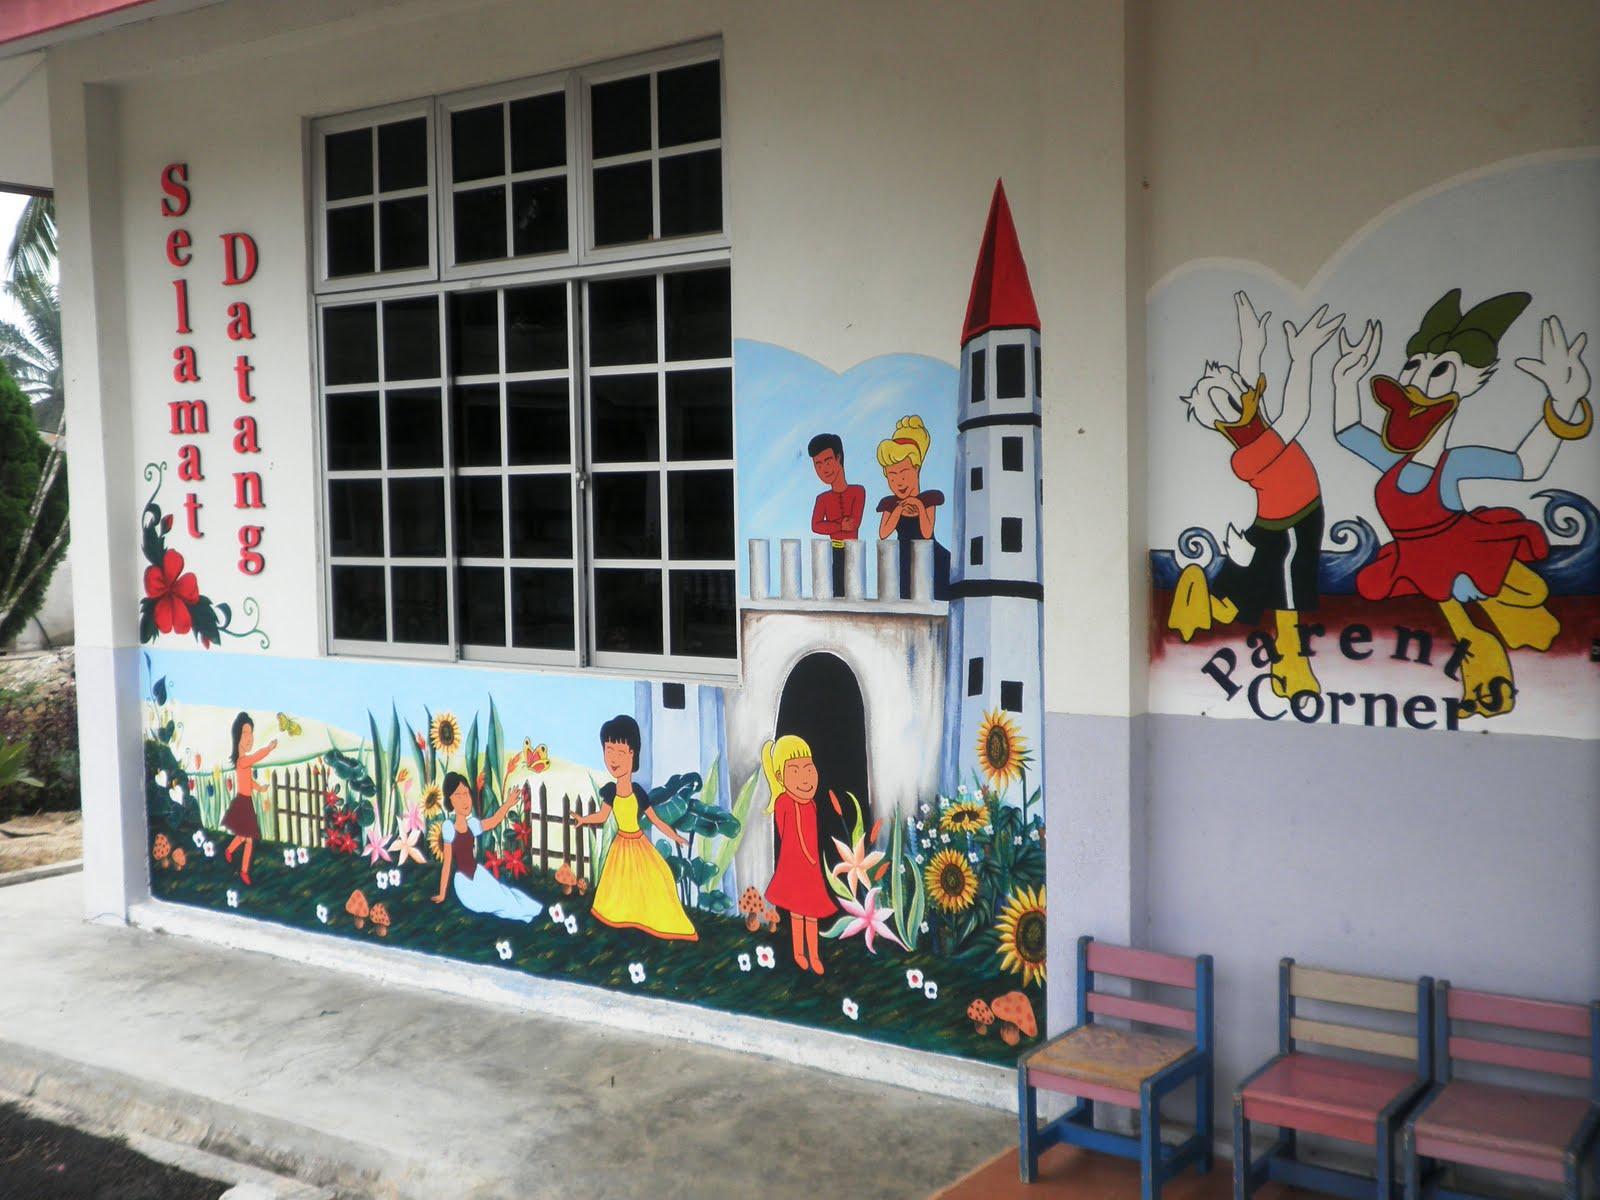 Tabika kemas redong 01 for Mural tadika